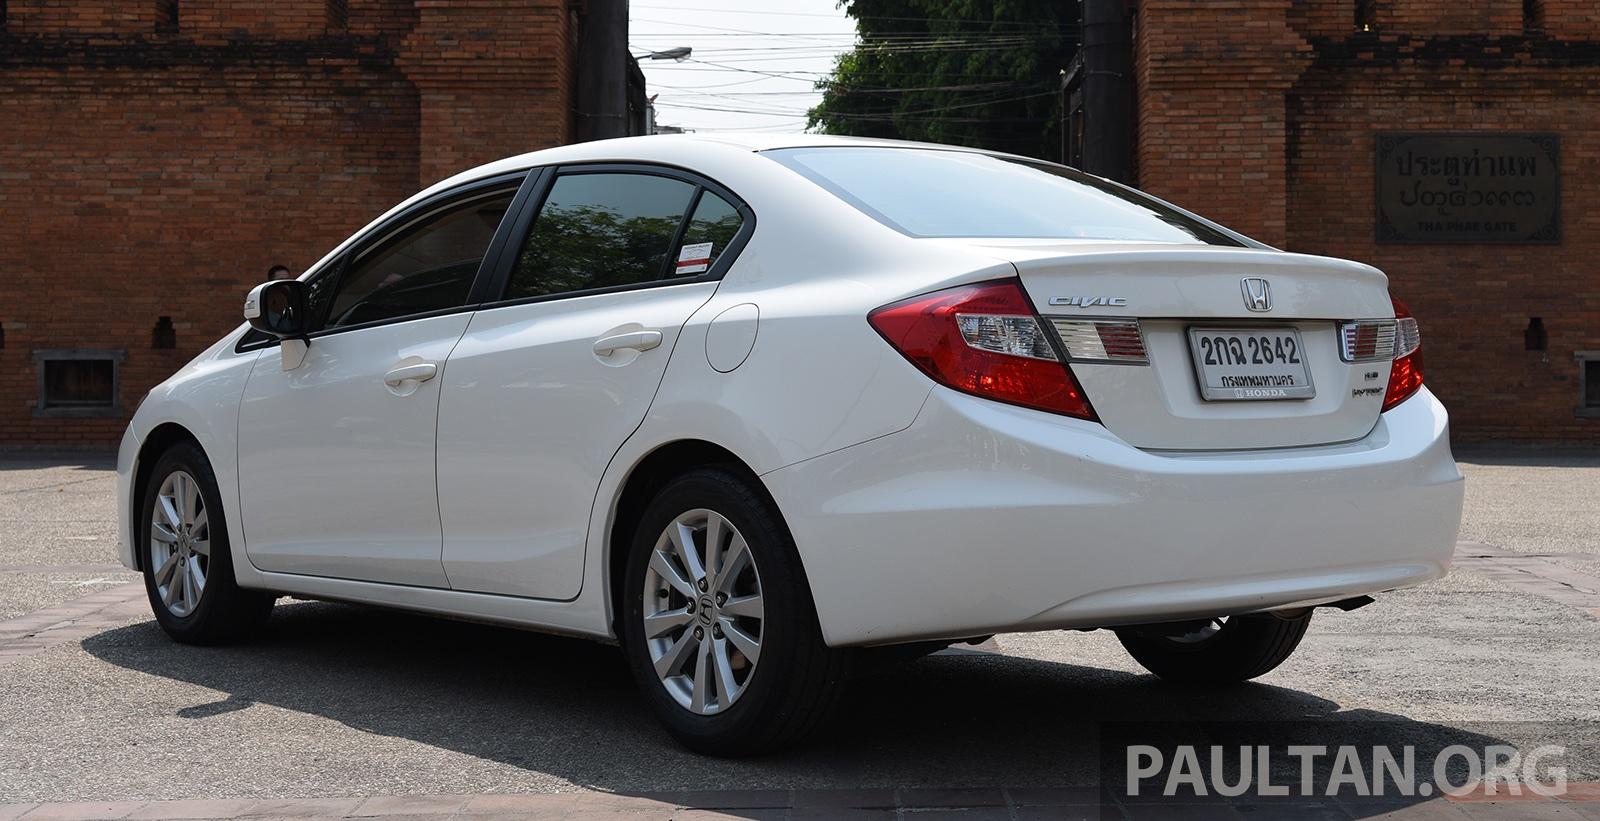 10Th Gen Civic >> GALLERY: Honda Civic – 10th-gen FC vs 9th-gen FB Paul Tan - Image 493047